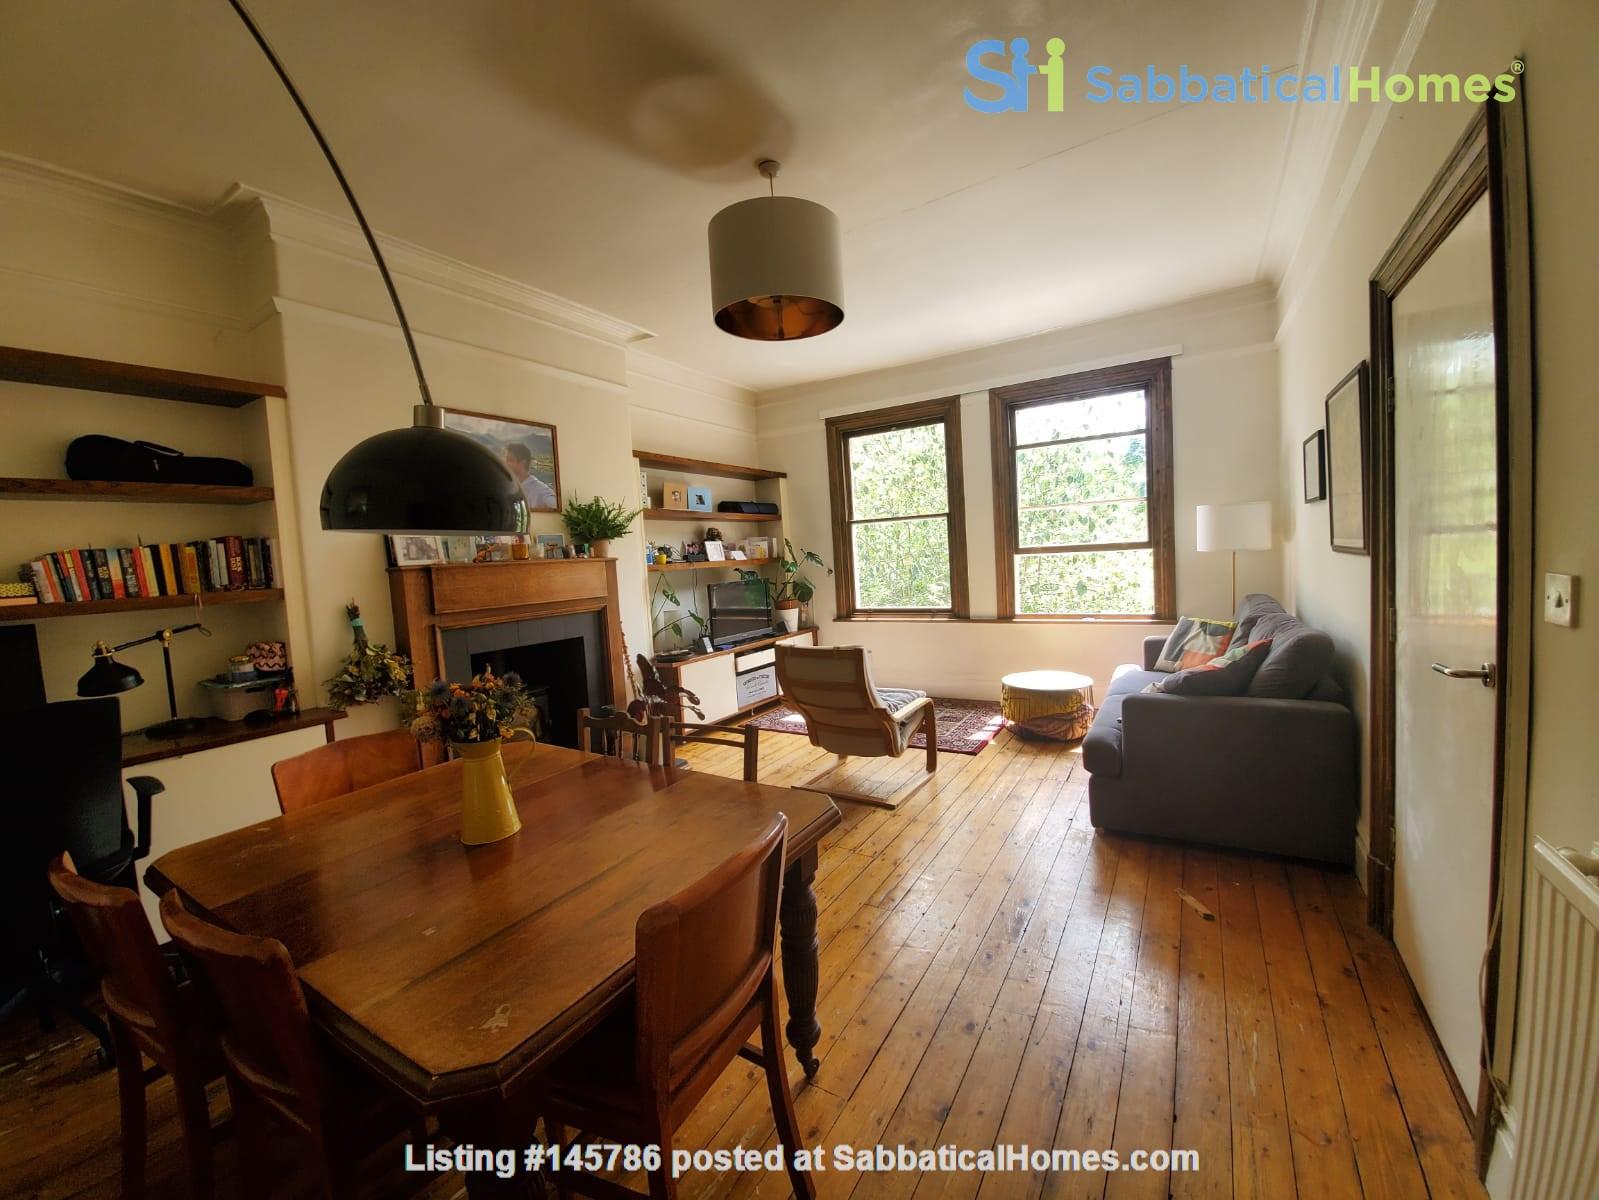 Manchester UK: Spacious, Quiet, Sunlight Filled Flat in Great Neighbourhood Home Rental in  2